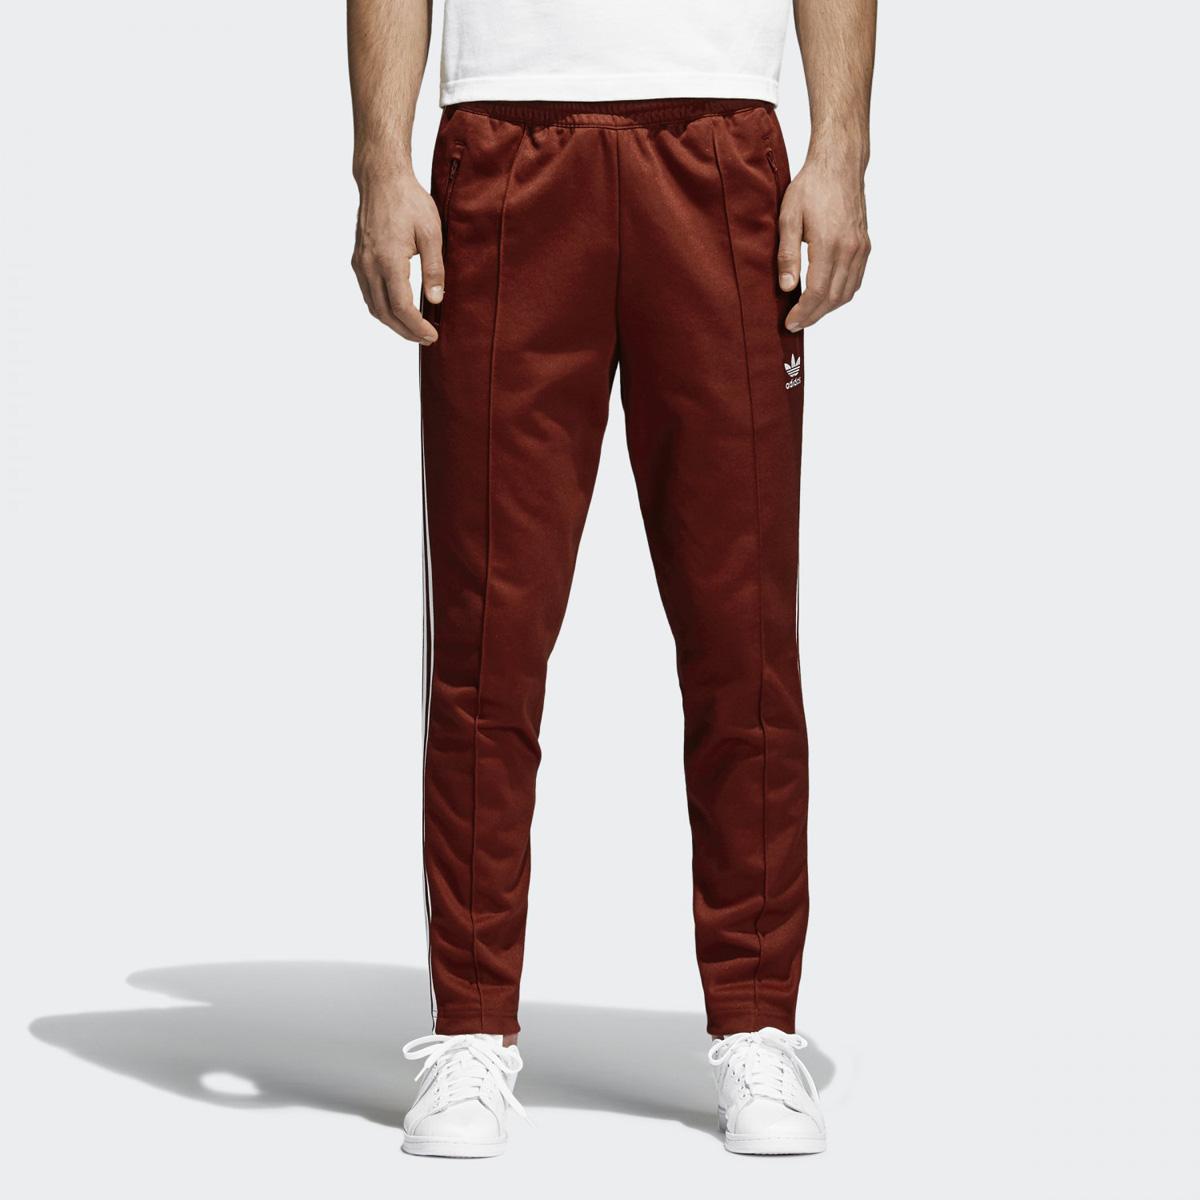 adidas Originals BECKENBAUER TRACK PANTS (Adidas originals Beckenbauer  trackpants) Rust Red 18SP-I 878f030d73